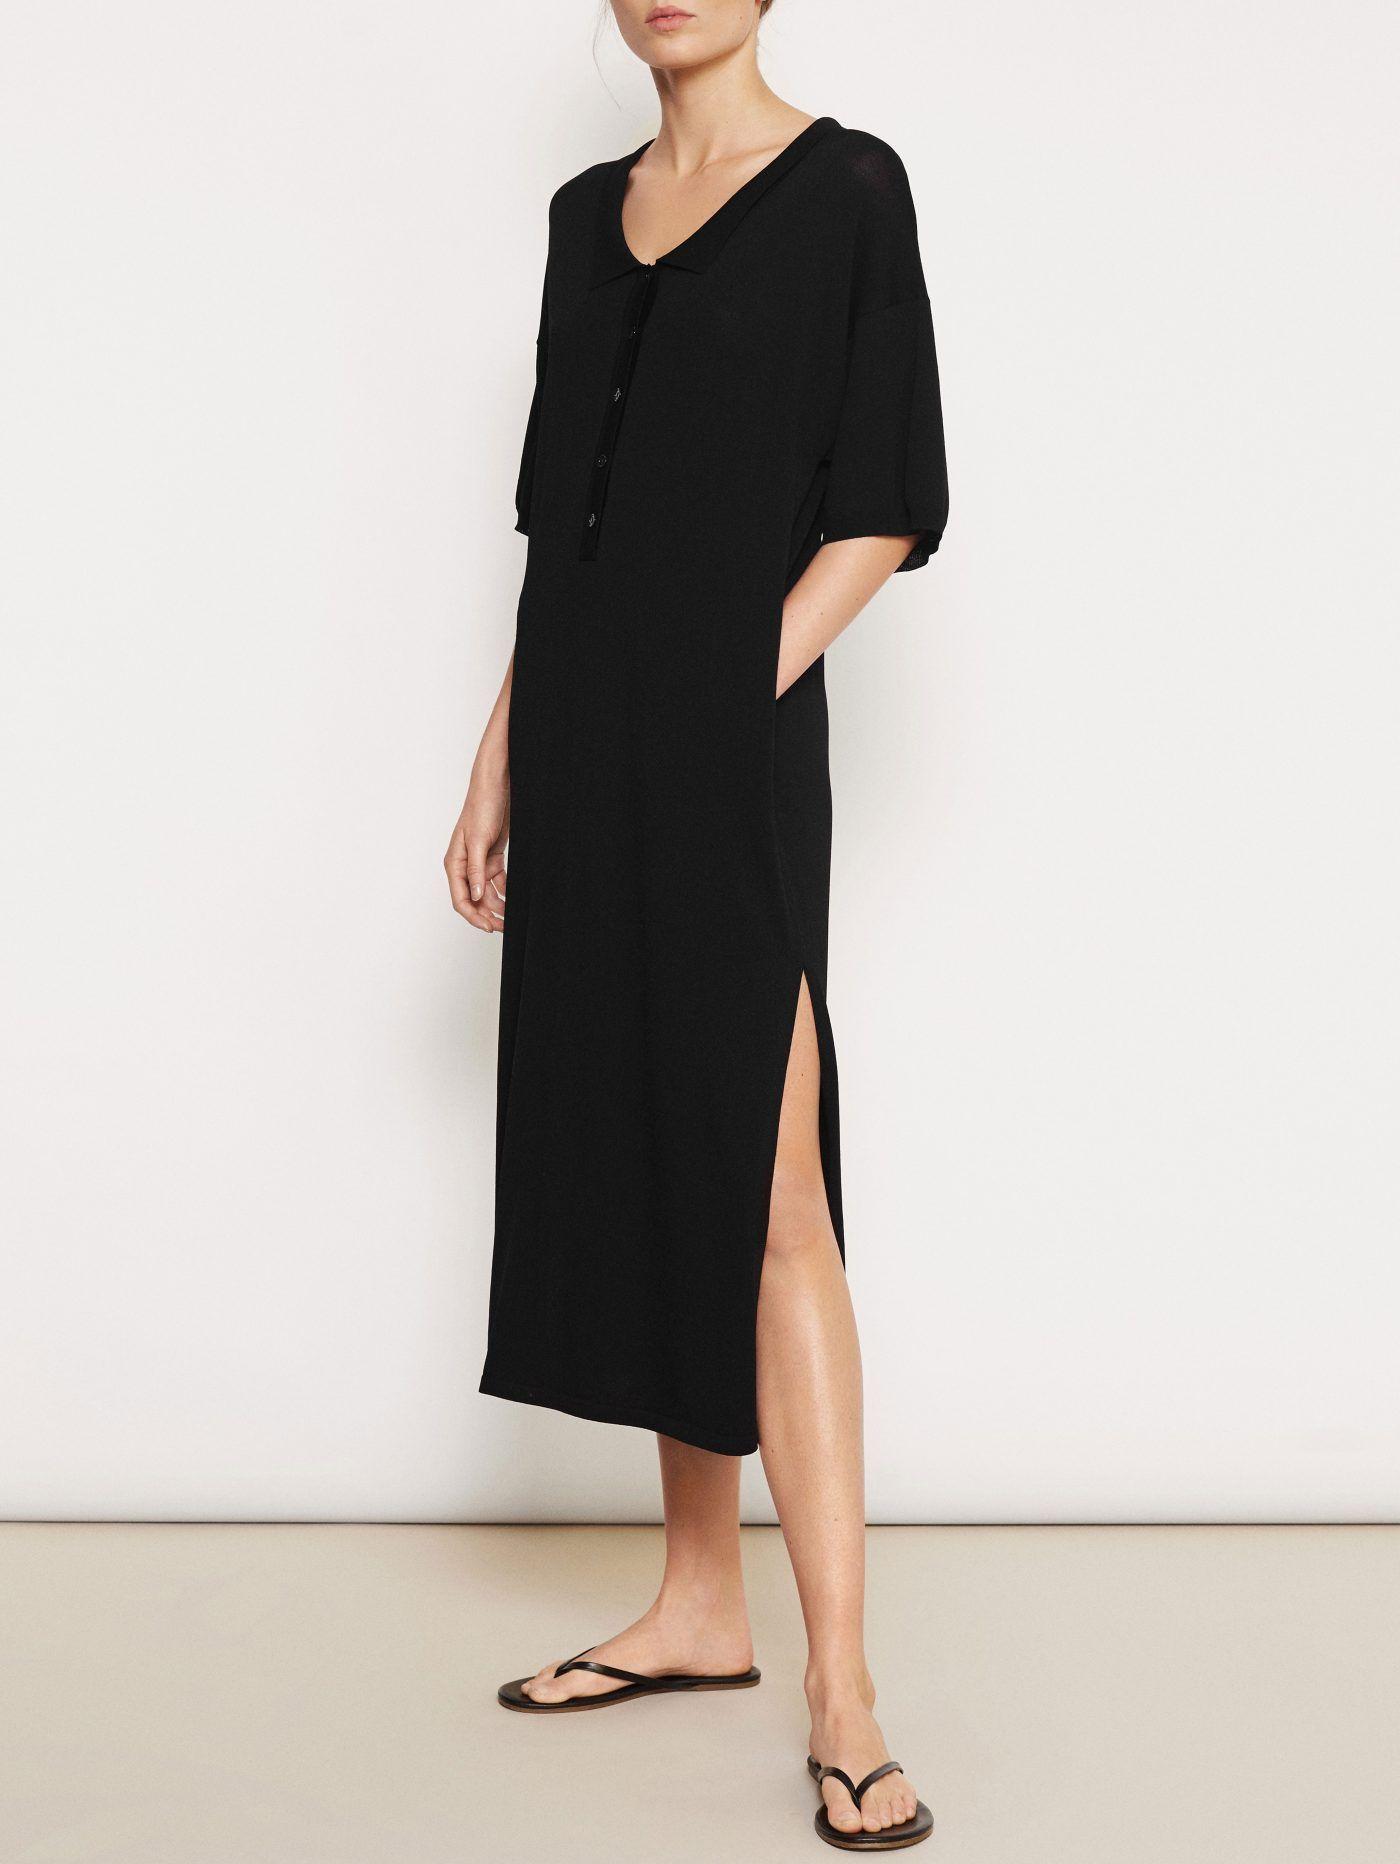 Dresses Skirts Fashion Dresses Black Dress [ 1864 x 1400 Pixel ]